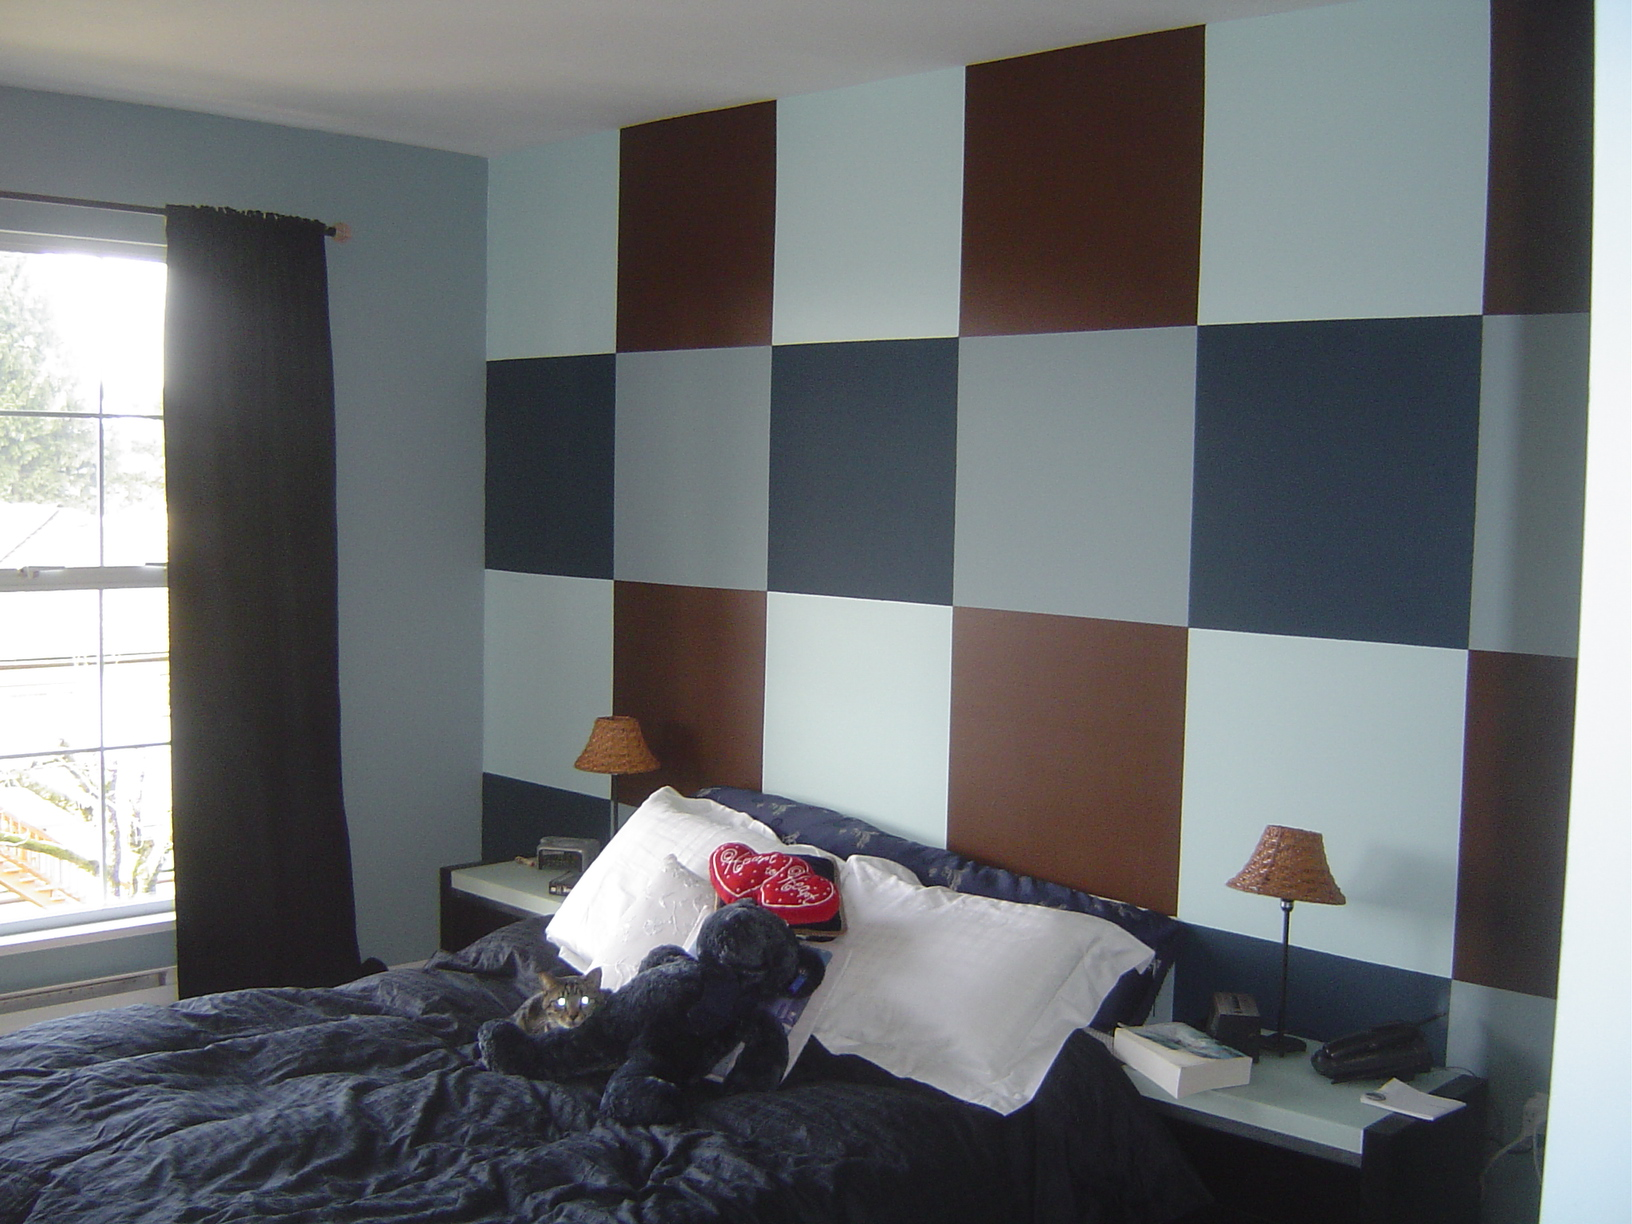 image کاغذ دیواری پشت تخت